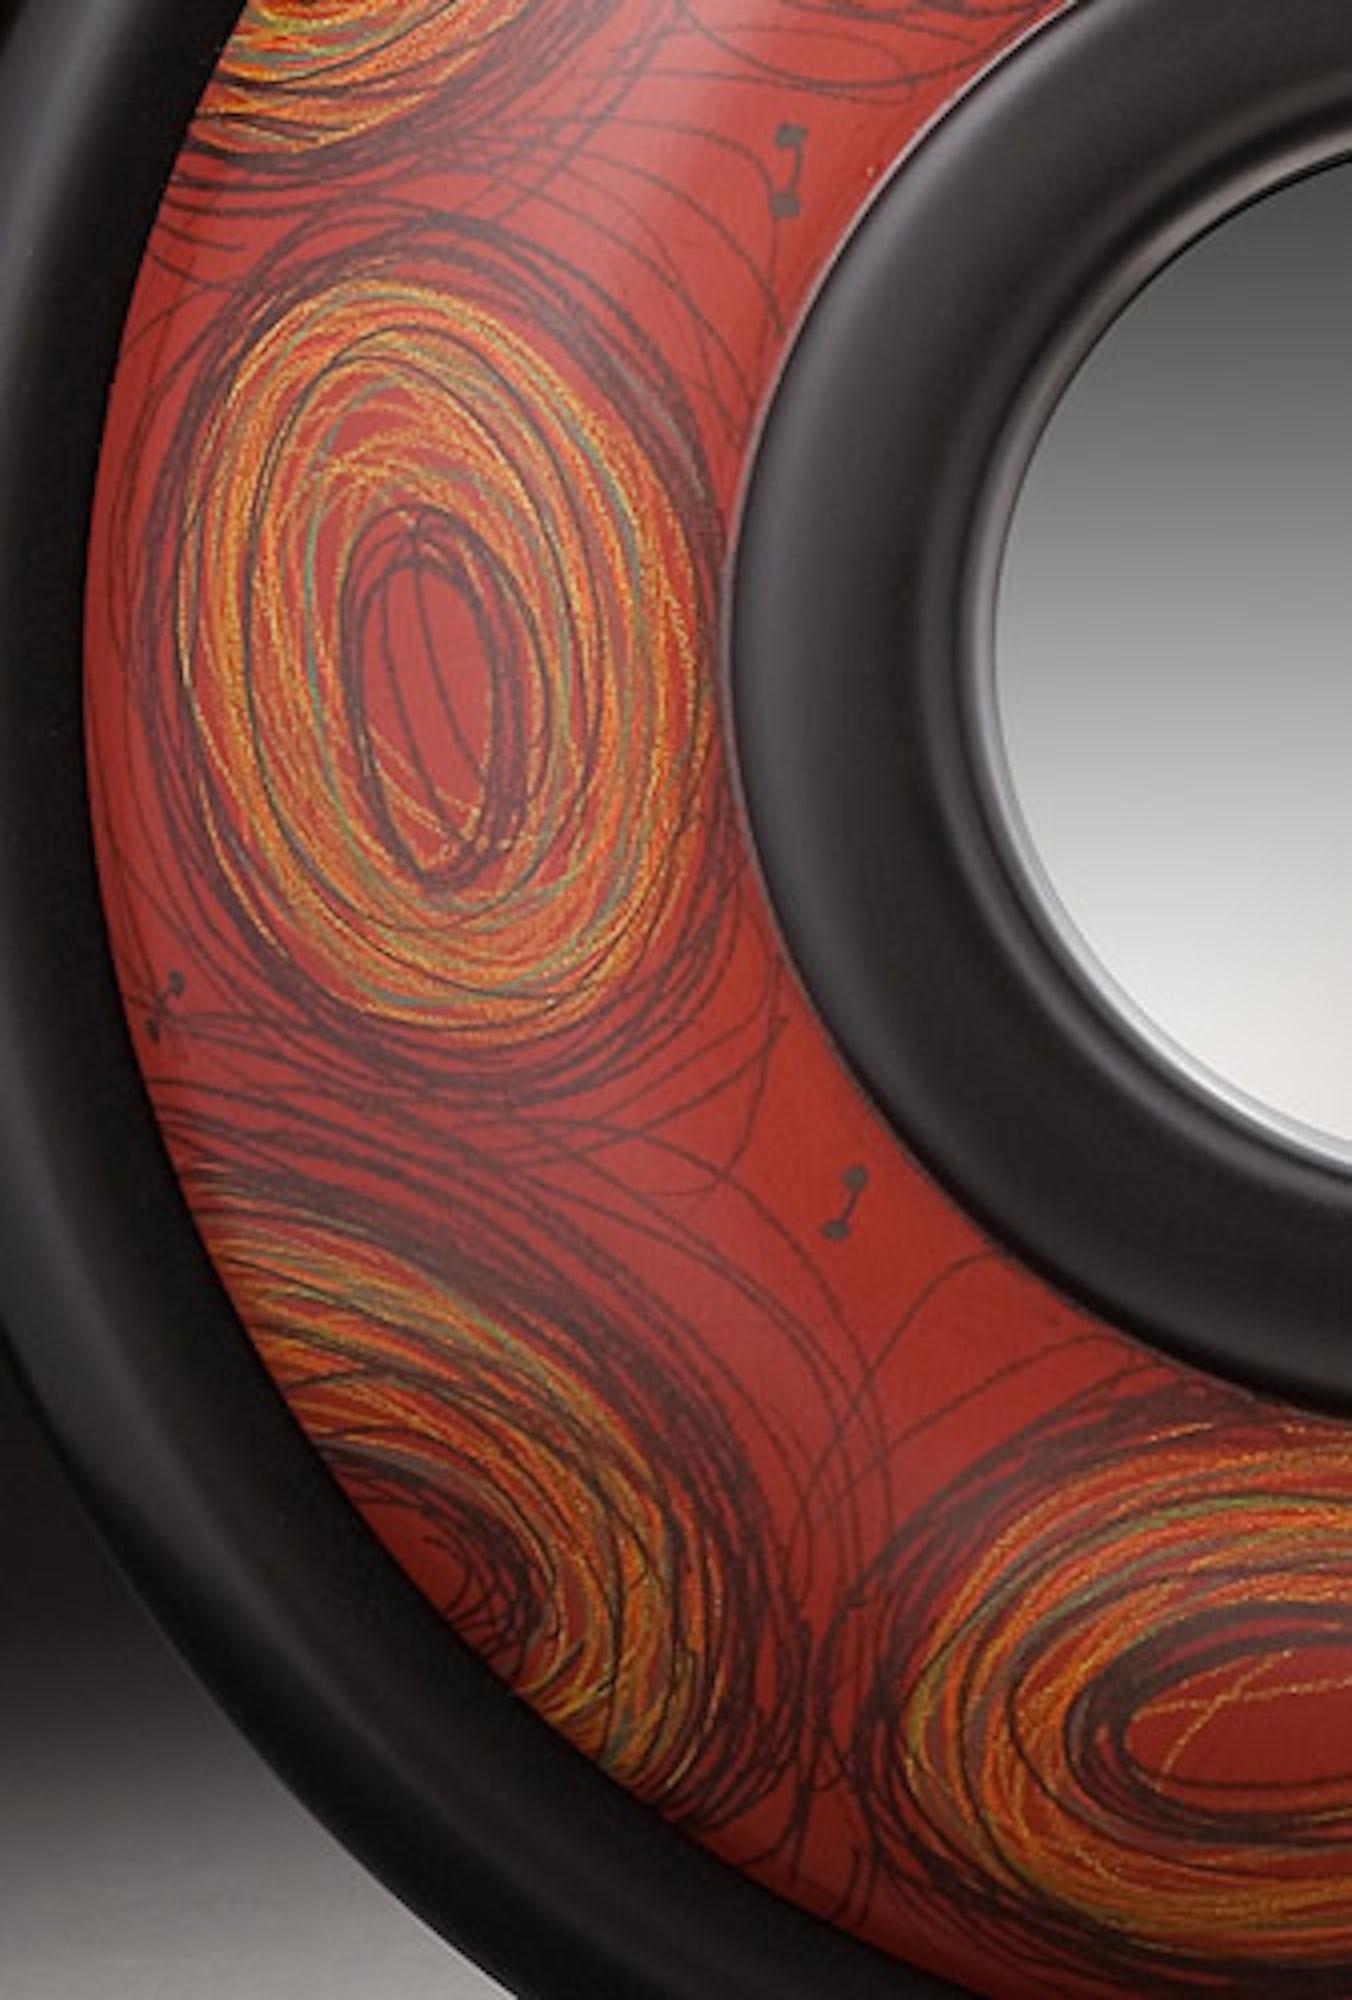 Red-Scribble-oculus-detail